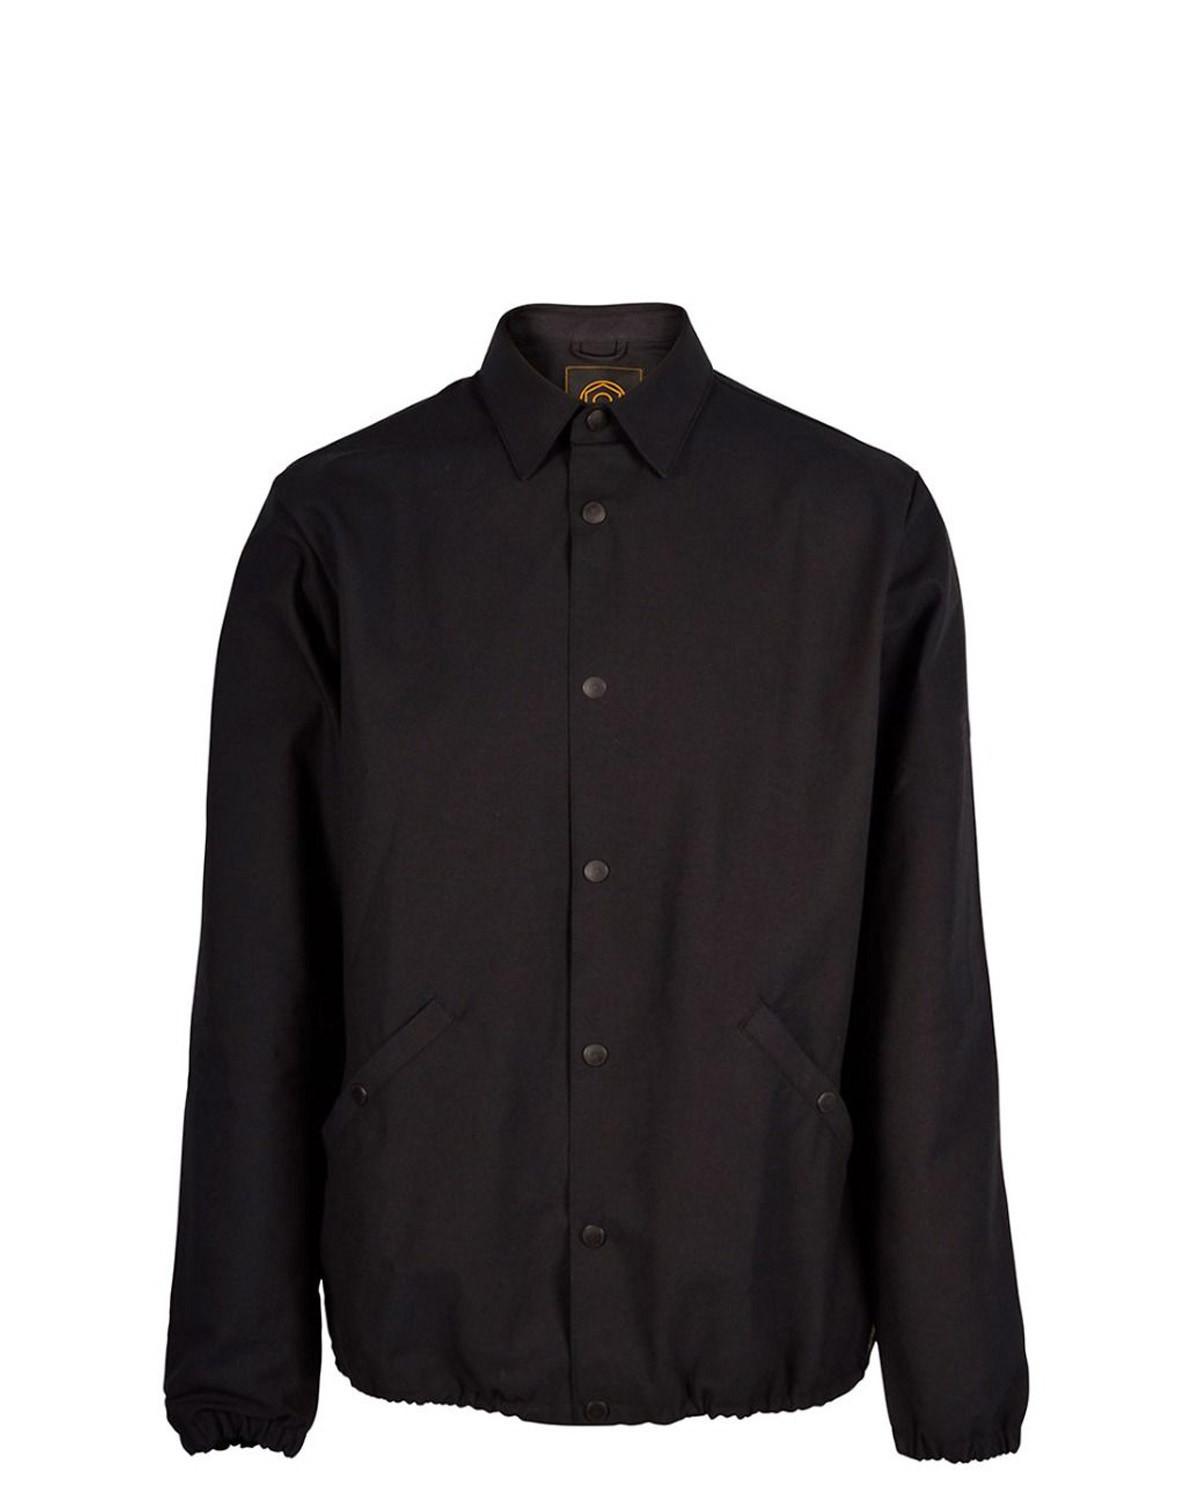 WRENCHMONKEES Skate Monkee Jacket (Sort, XL)